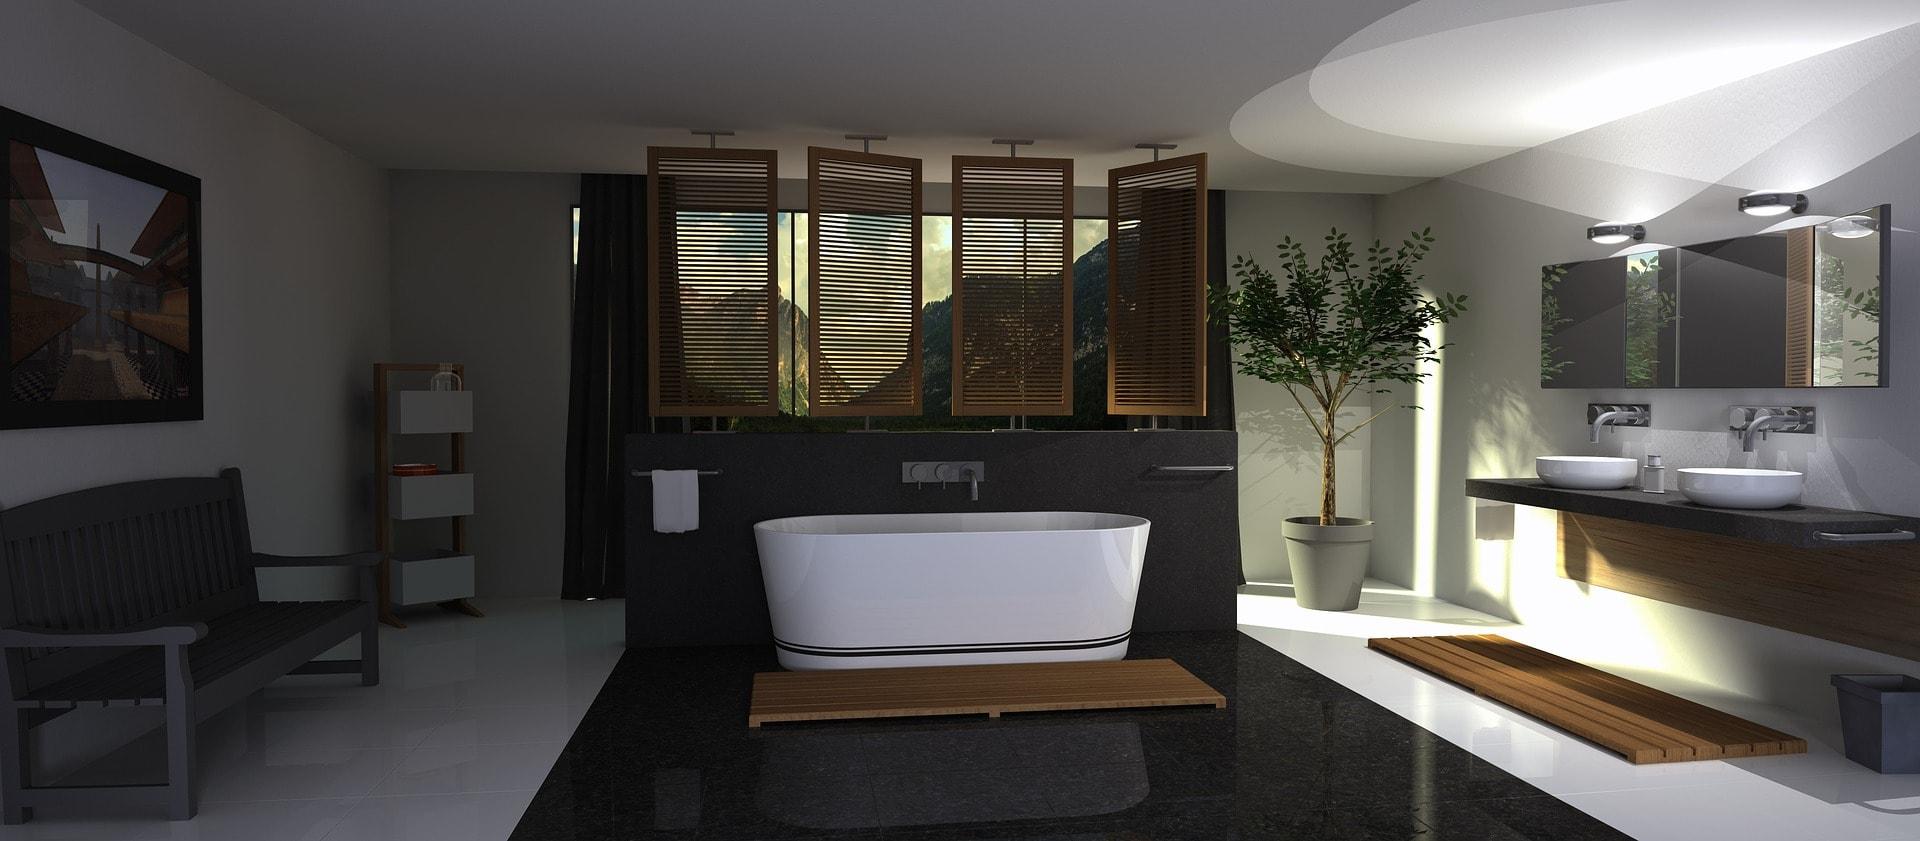 Bathroom Interior Design Trends 2020.14 Trends Update Your Bathroom For 2020 Fine Home Lamps